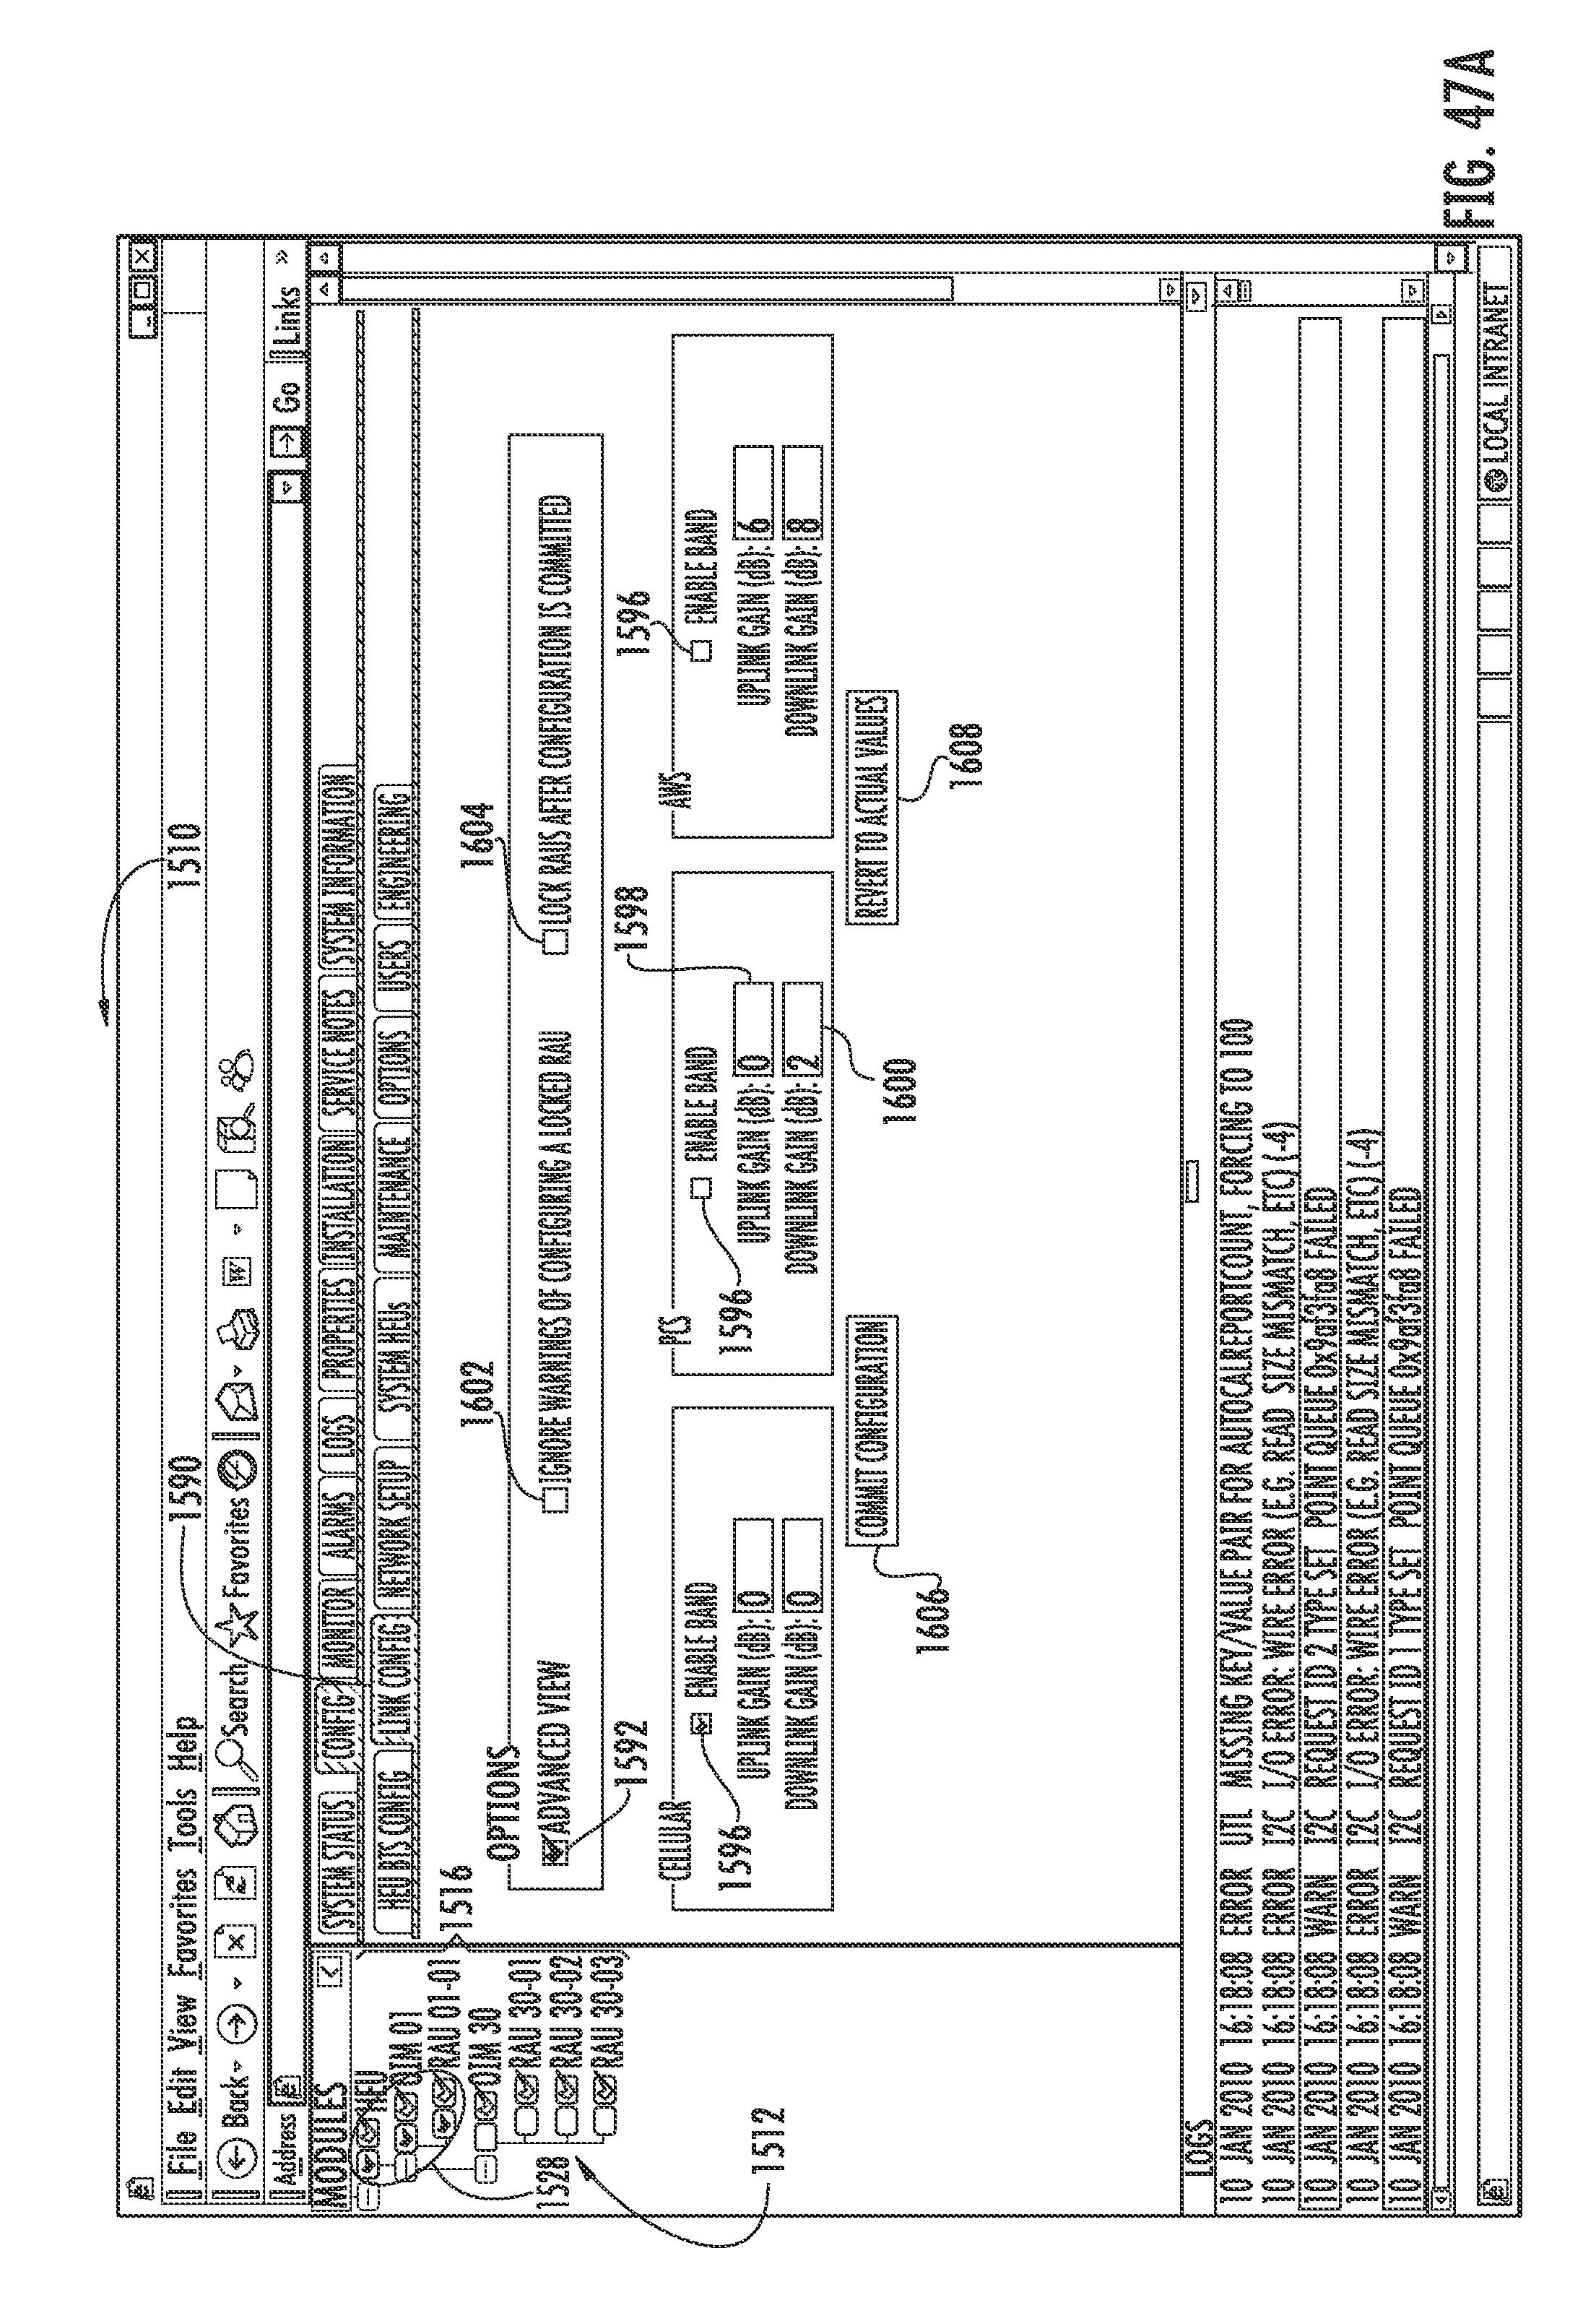 Patent US 9,112,611 B2